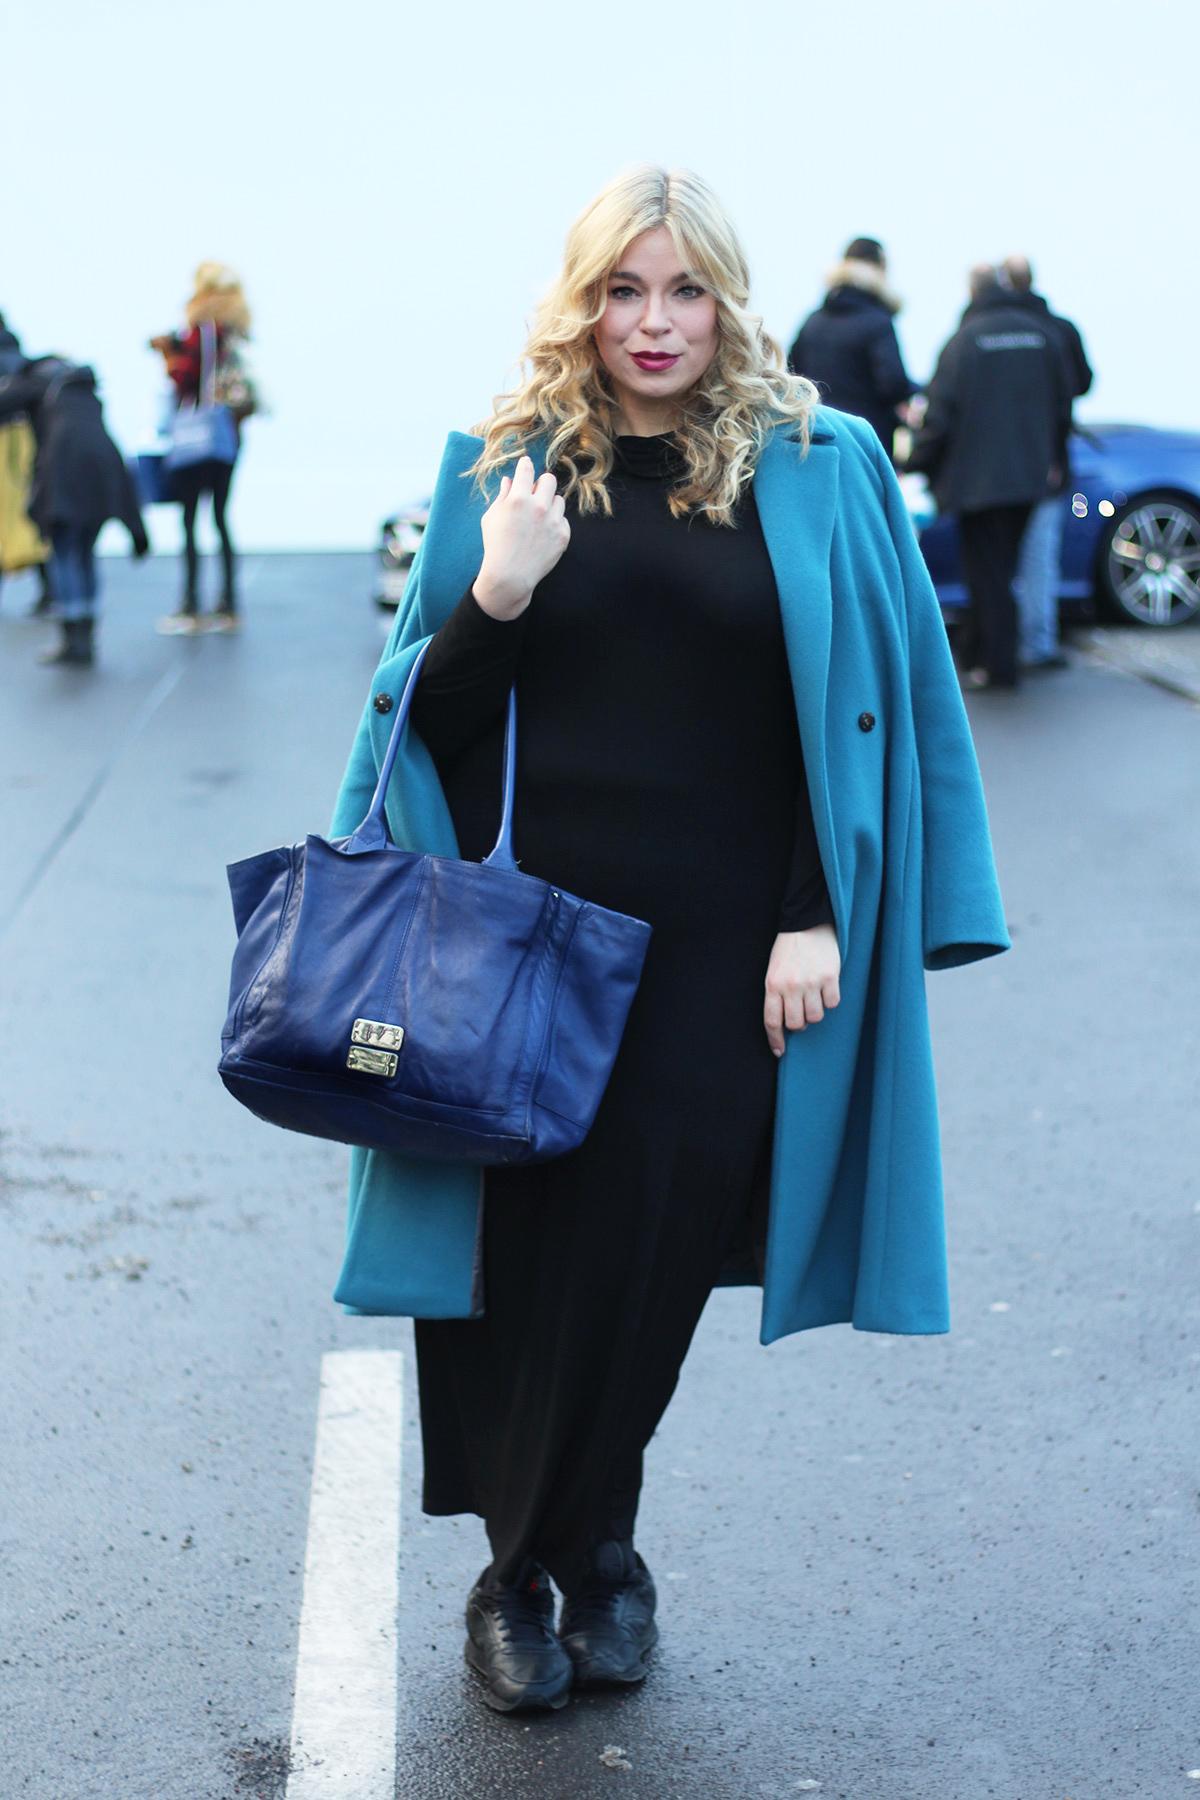 Fashion week-Megabambi-Marinarinaldi-Caterinapogorzelski-Plussizeblogger-Plussizemodel